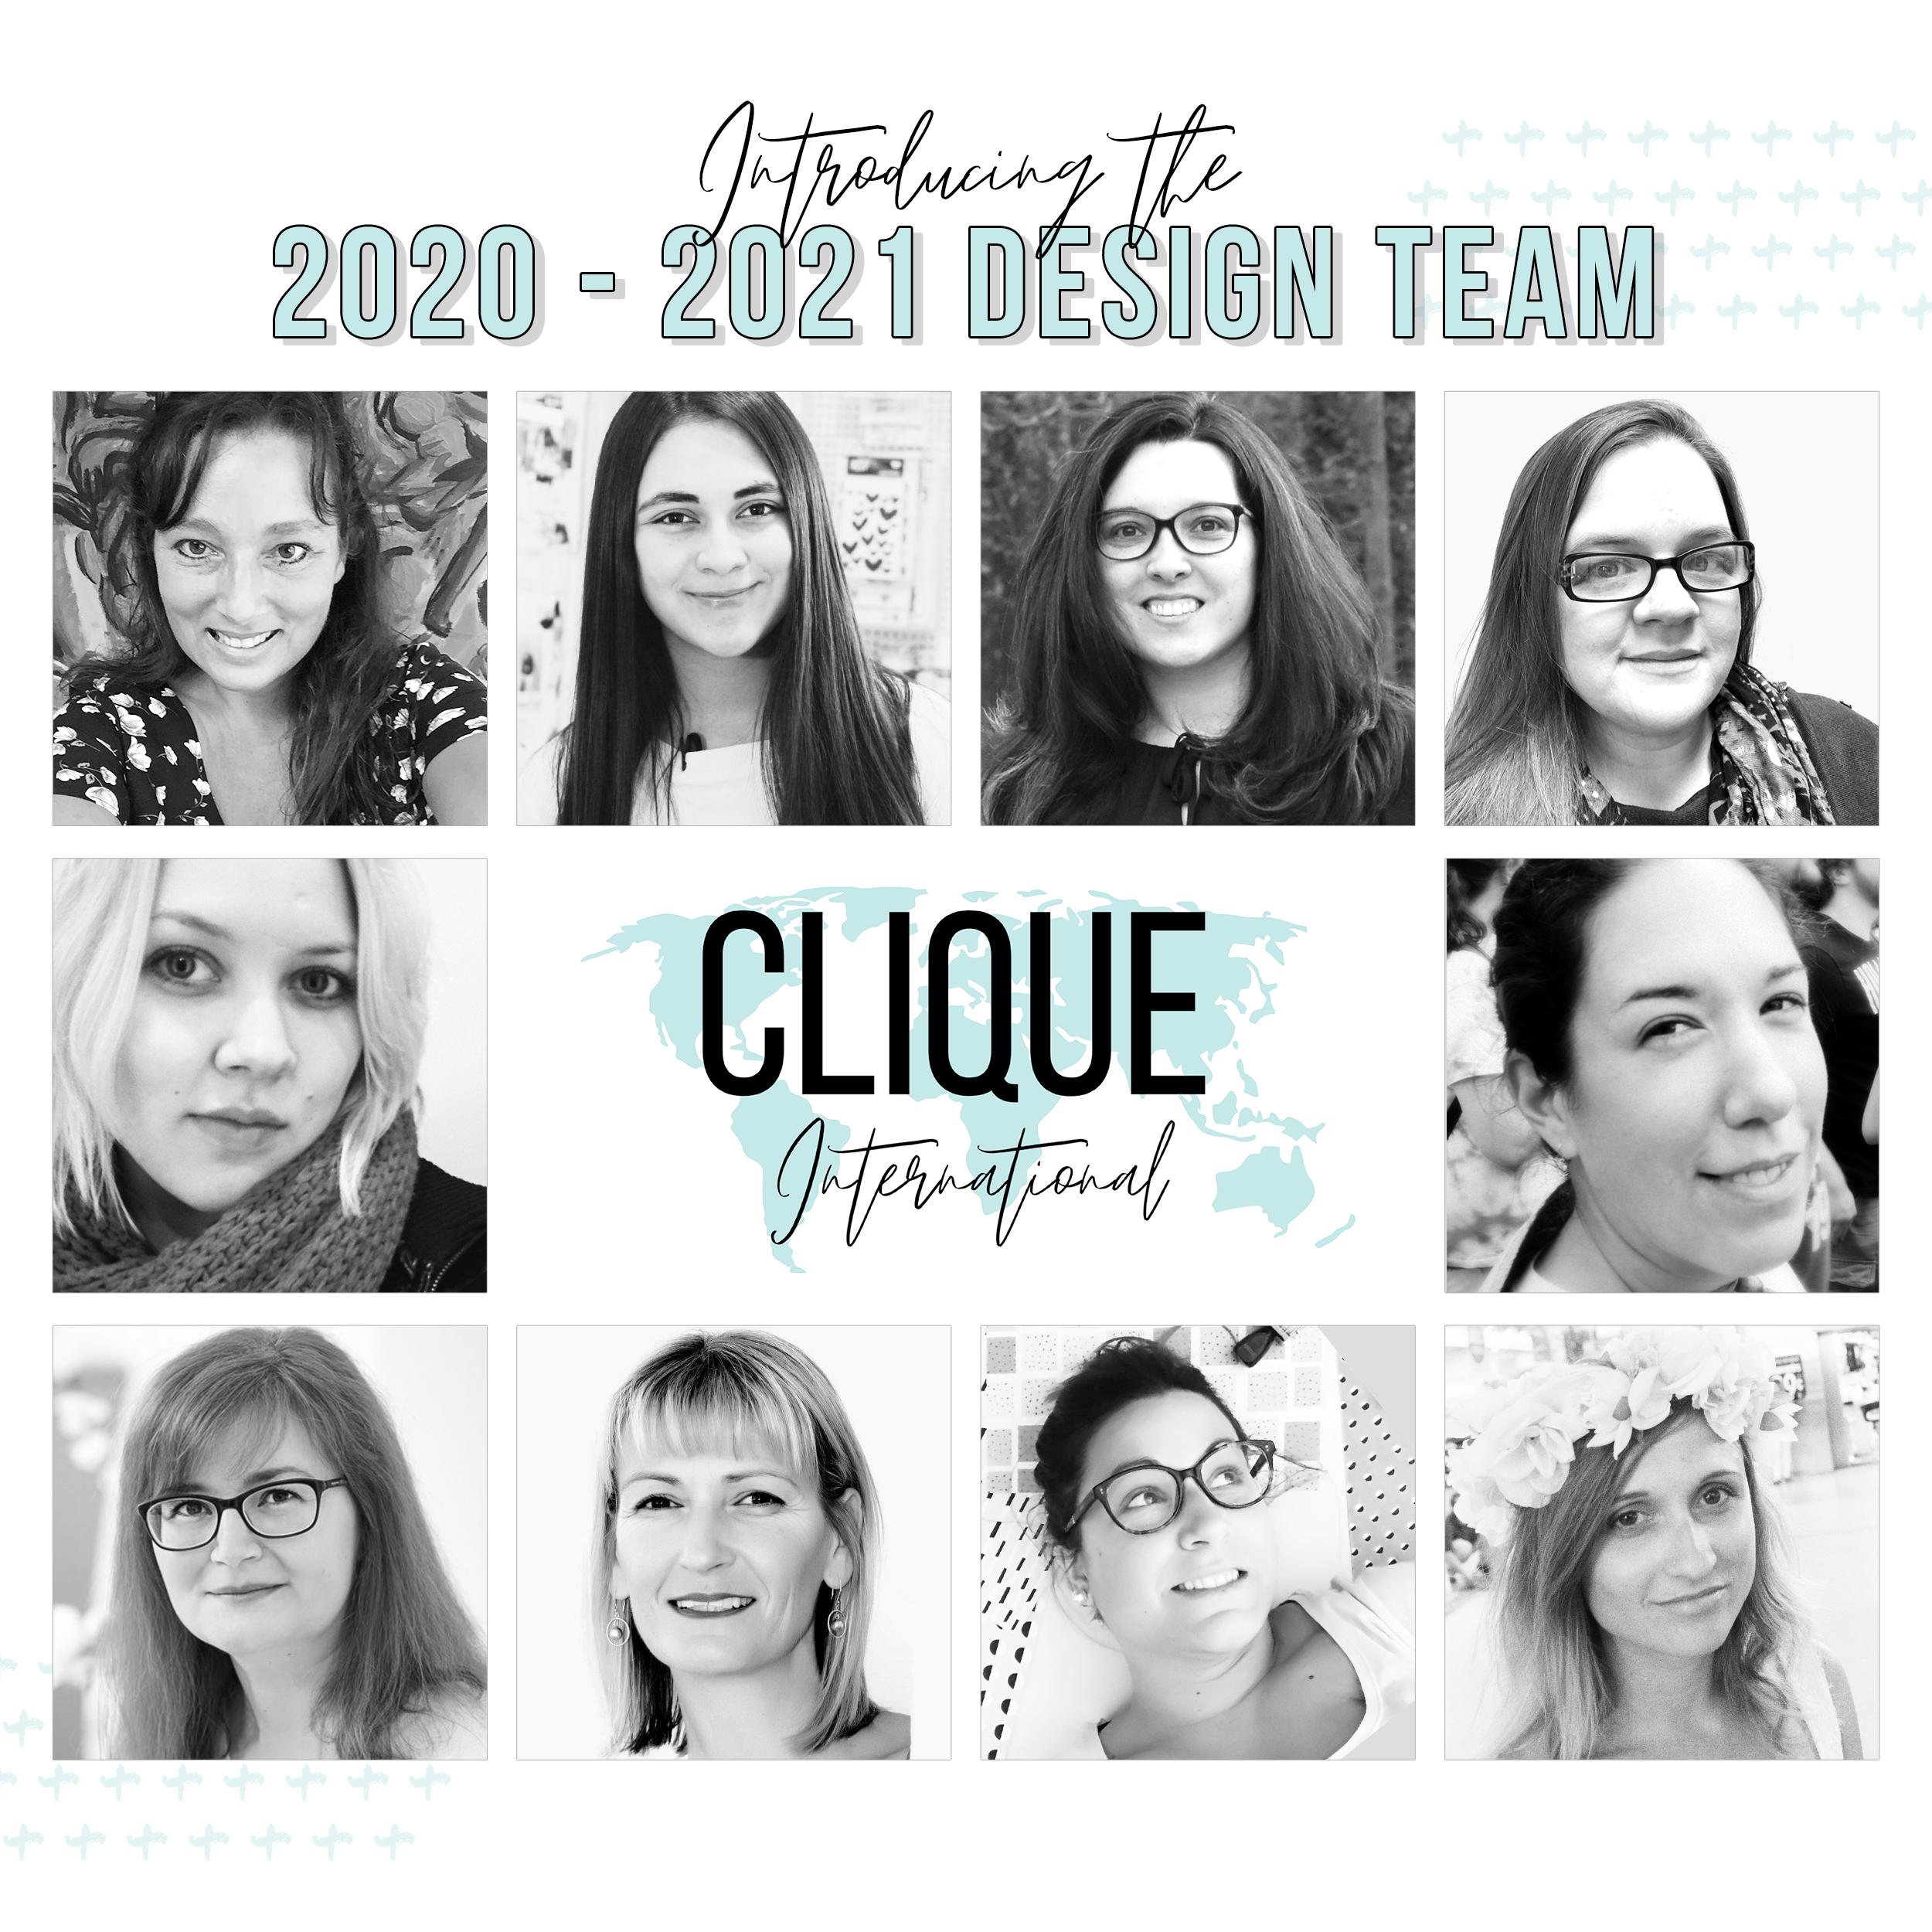 2020-2021-clique-international-design-team-announcement.png